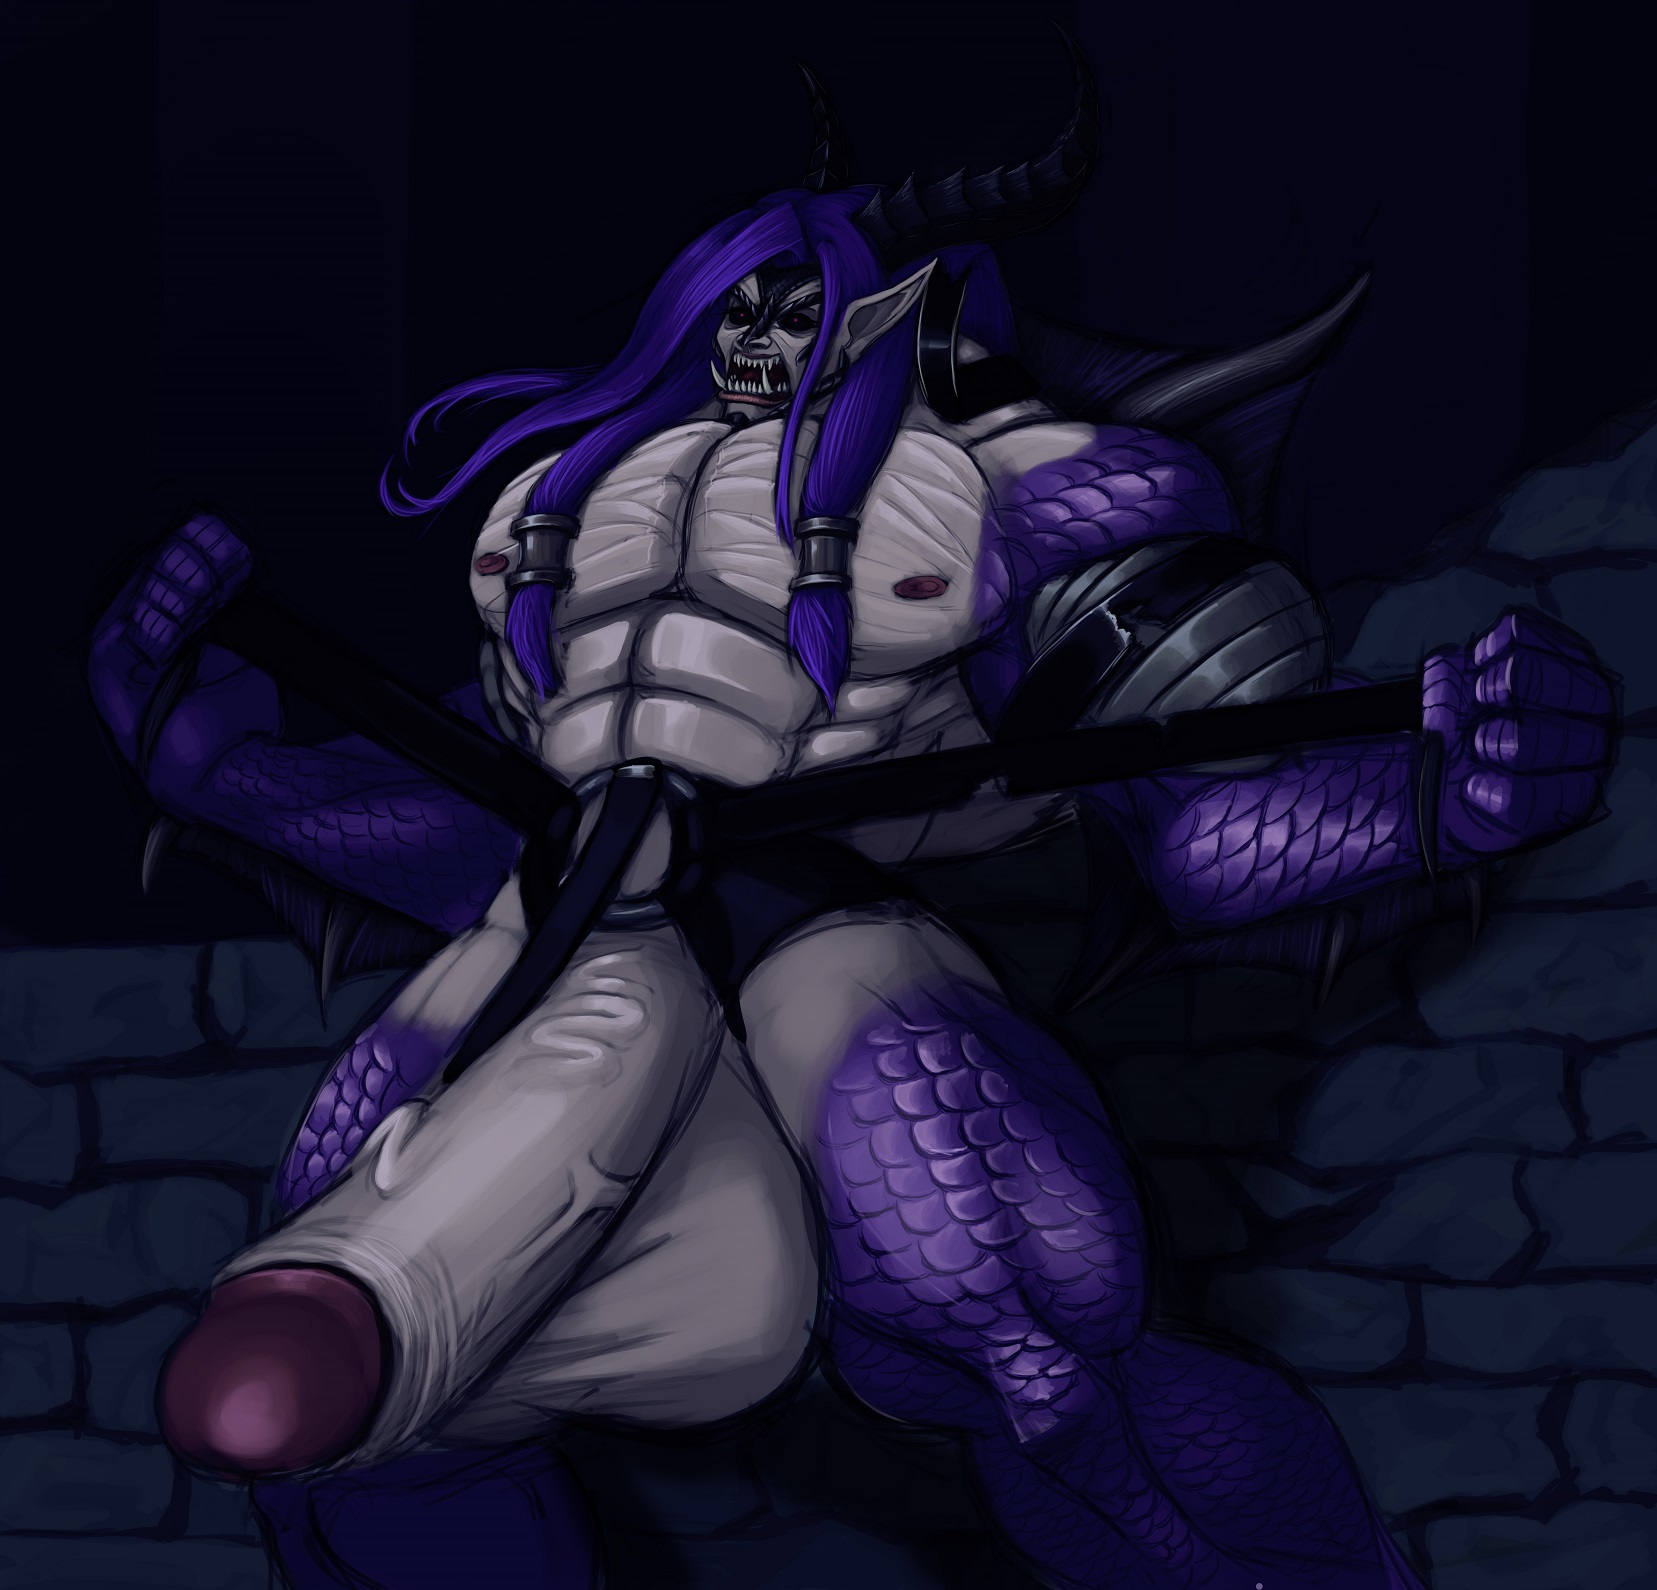 Breaking free; Dragon muscle g